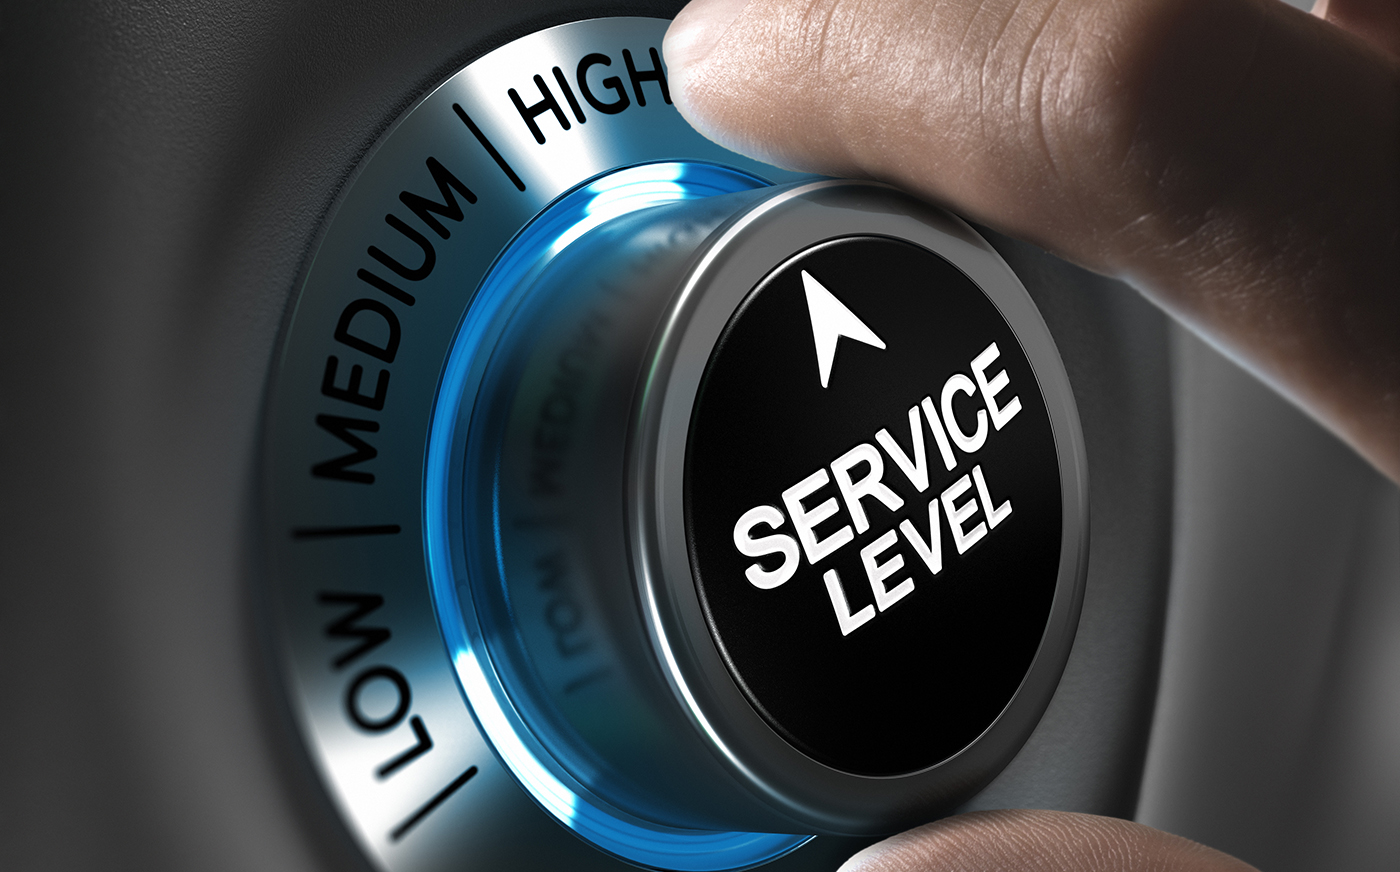 KruCon Servicelevel high.jpg